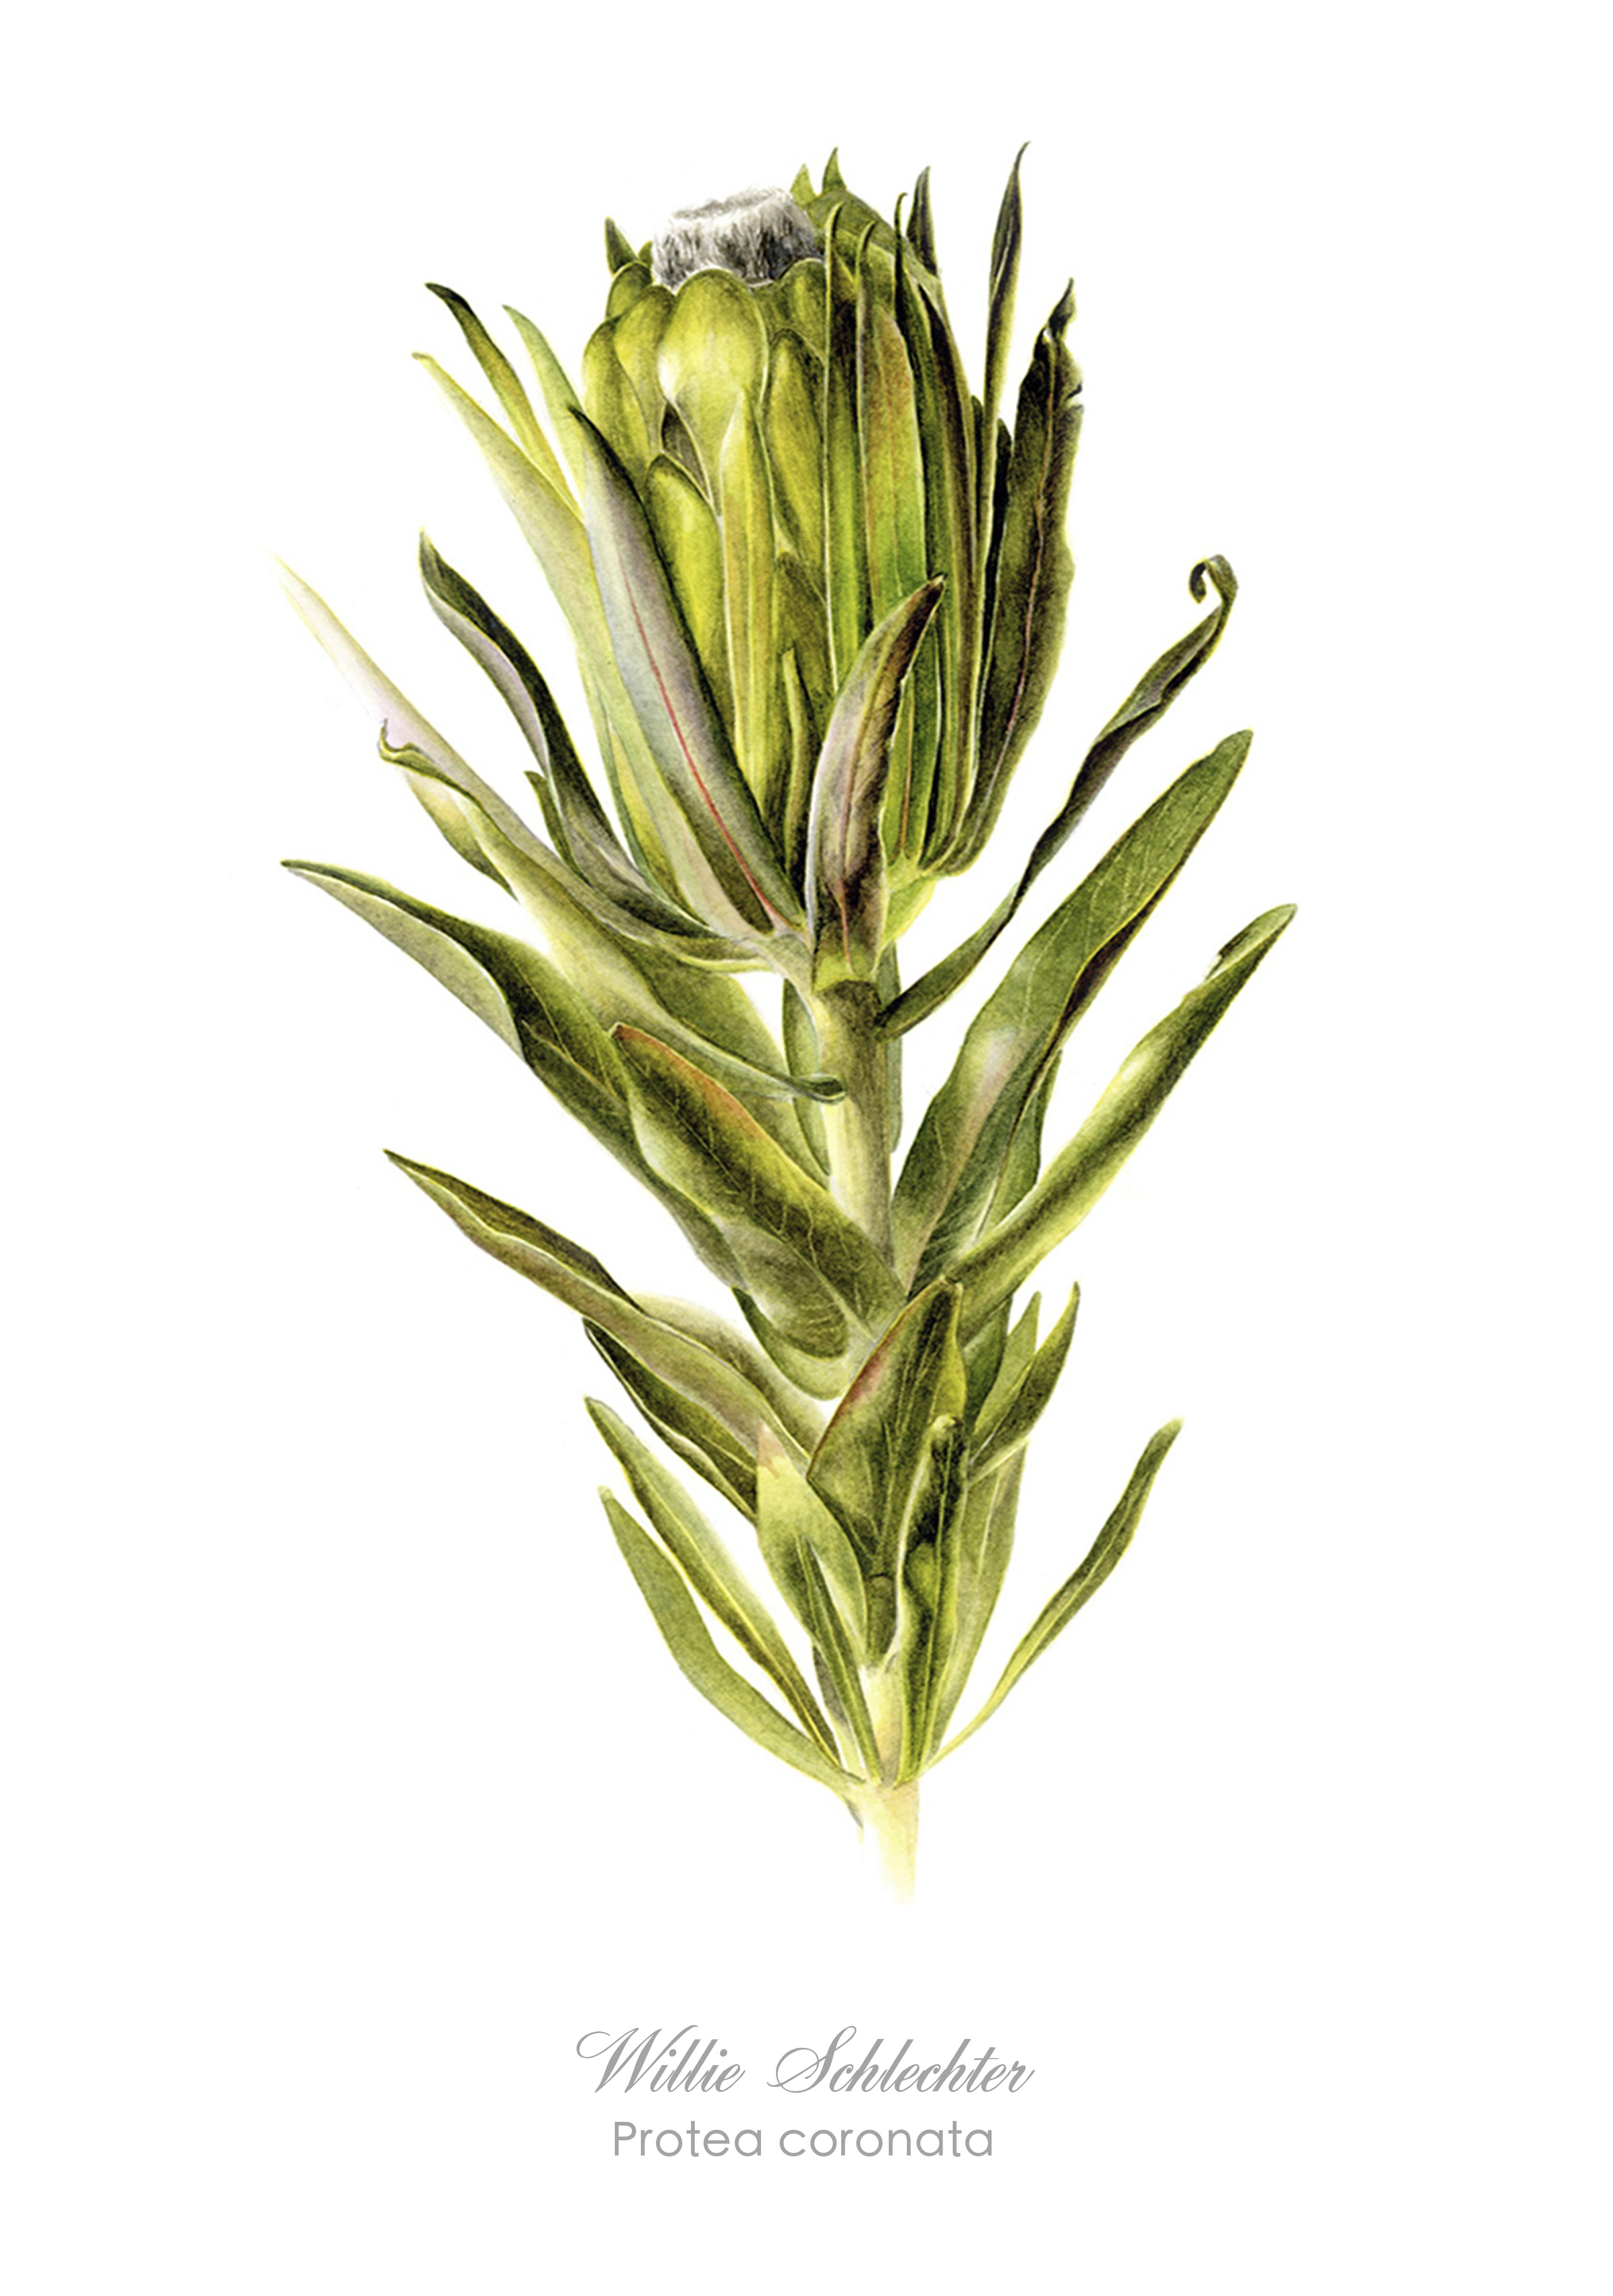 Protea coronata